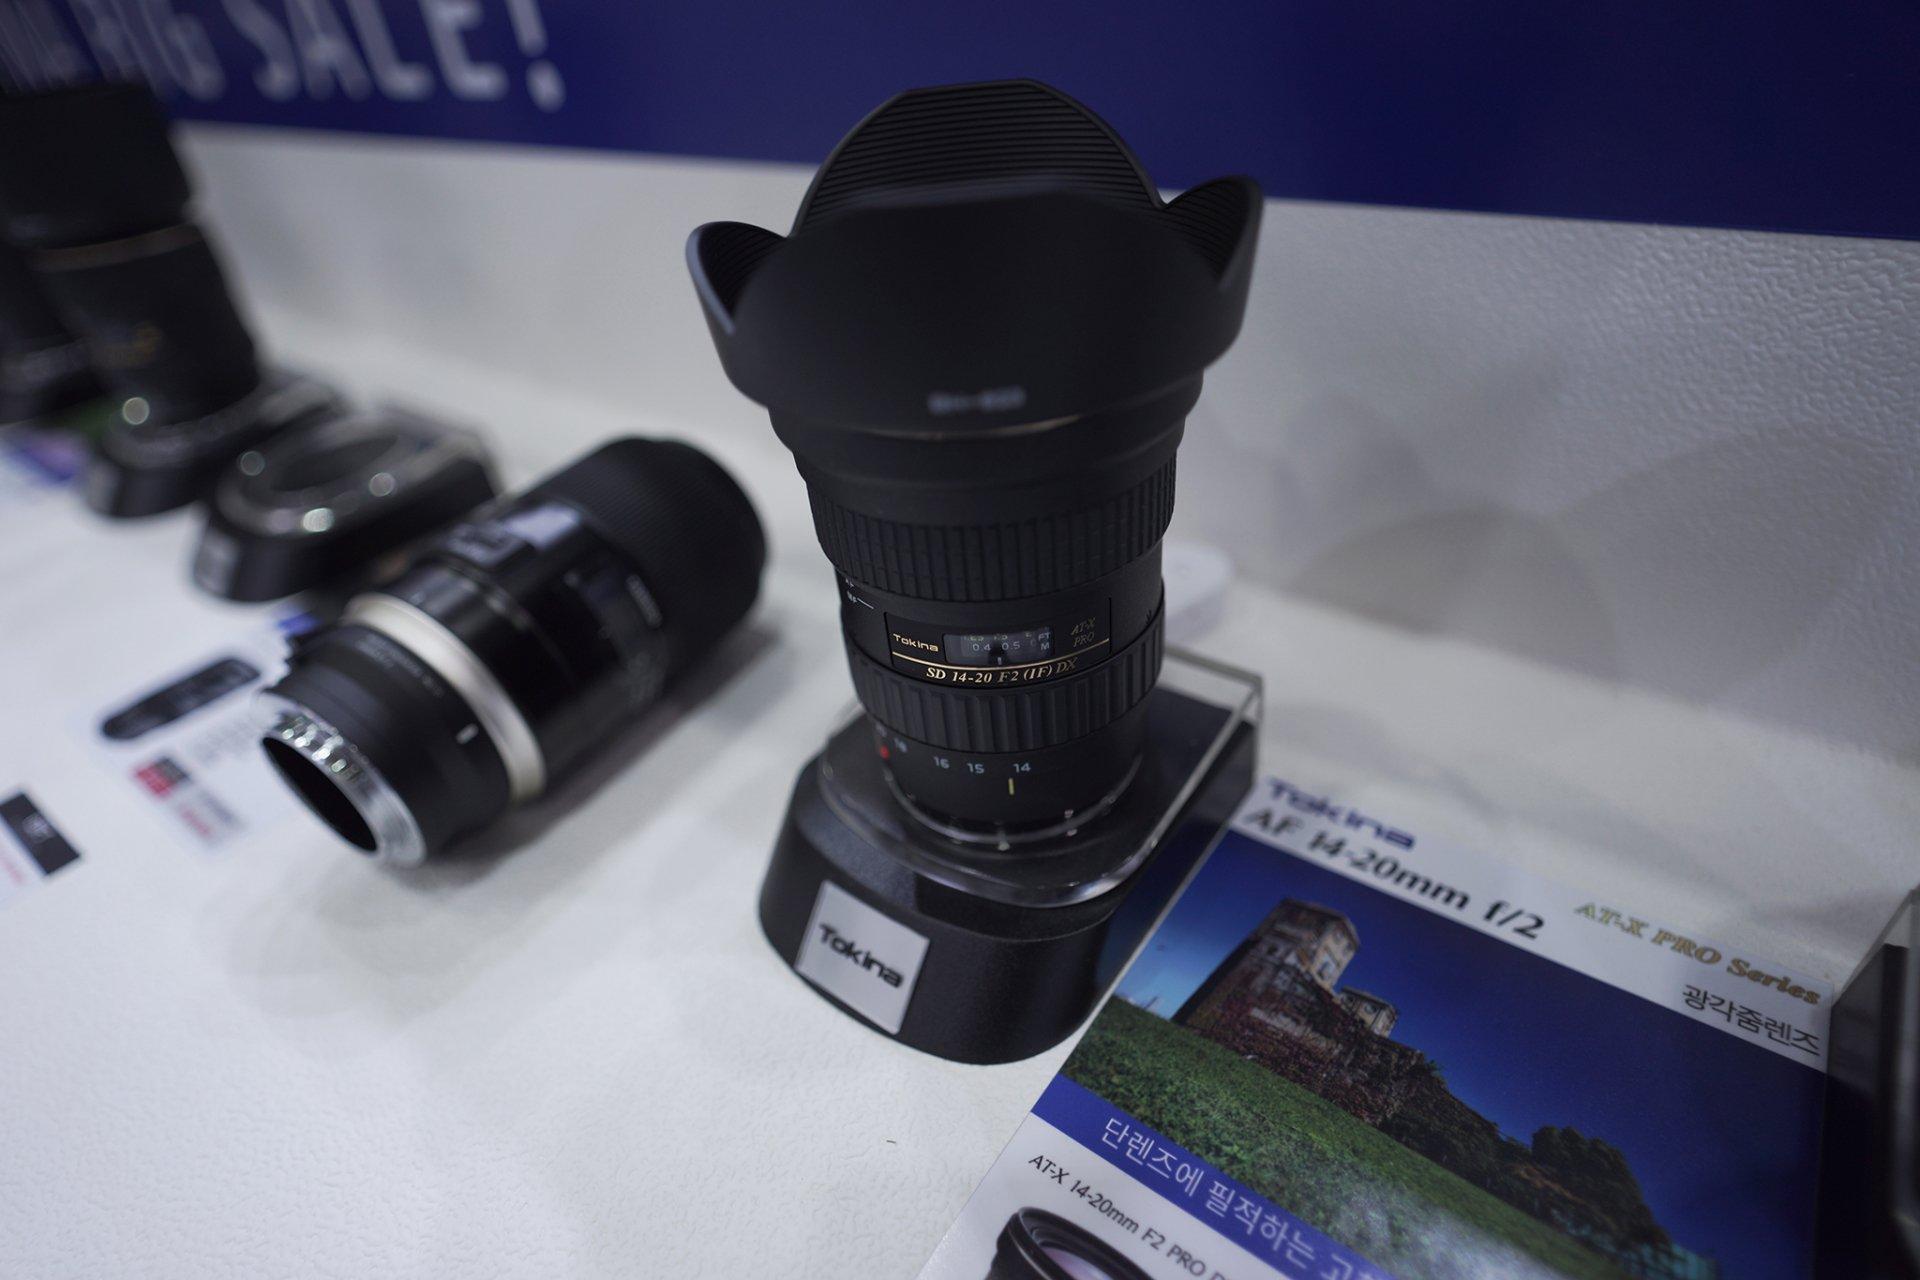 Triển lãm Photo & Imaging 2018 tại Seoul